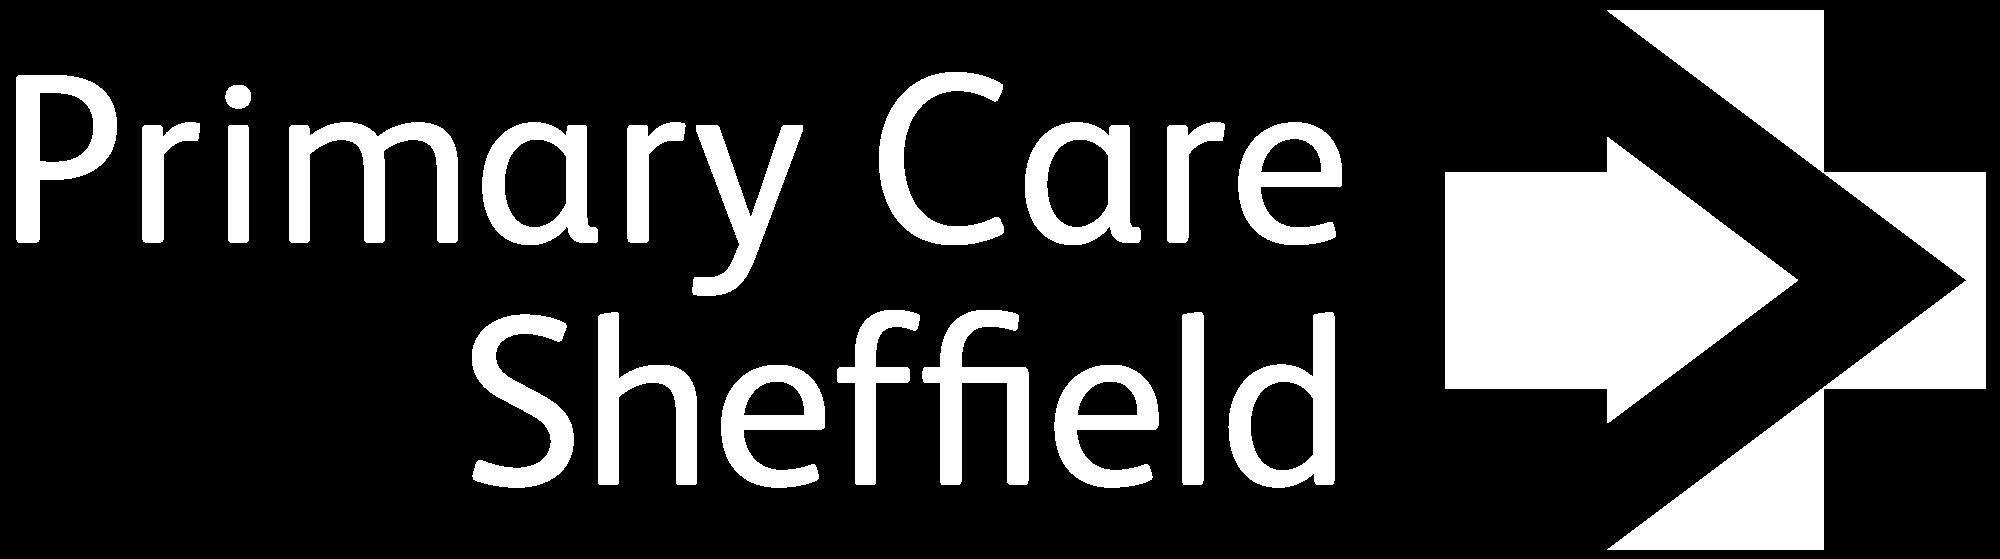 Primary Care Sheffield Logo